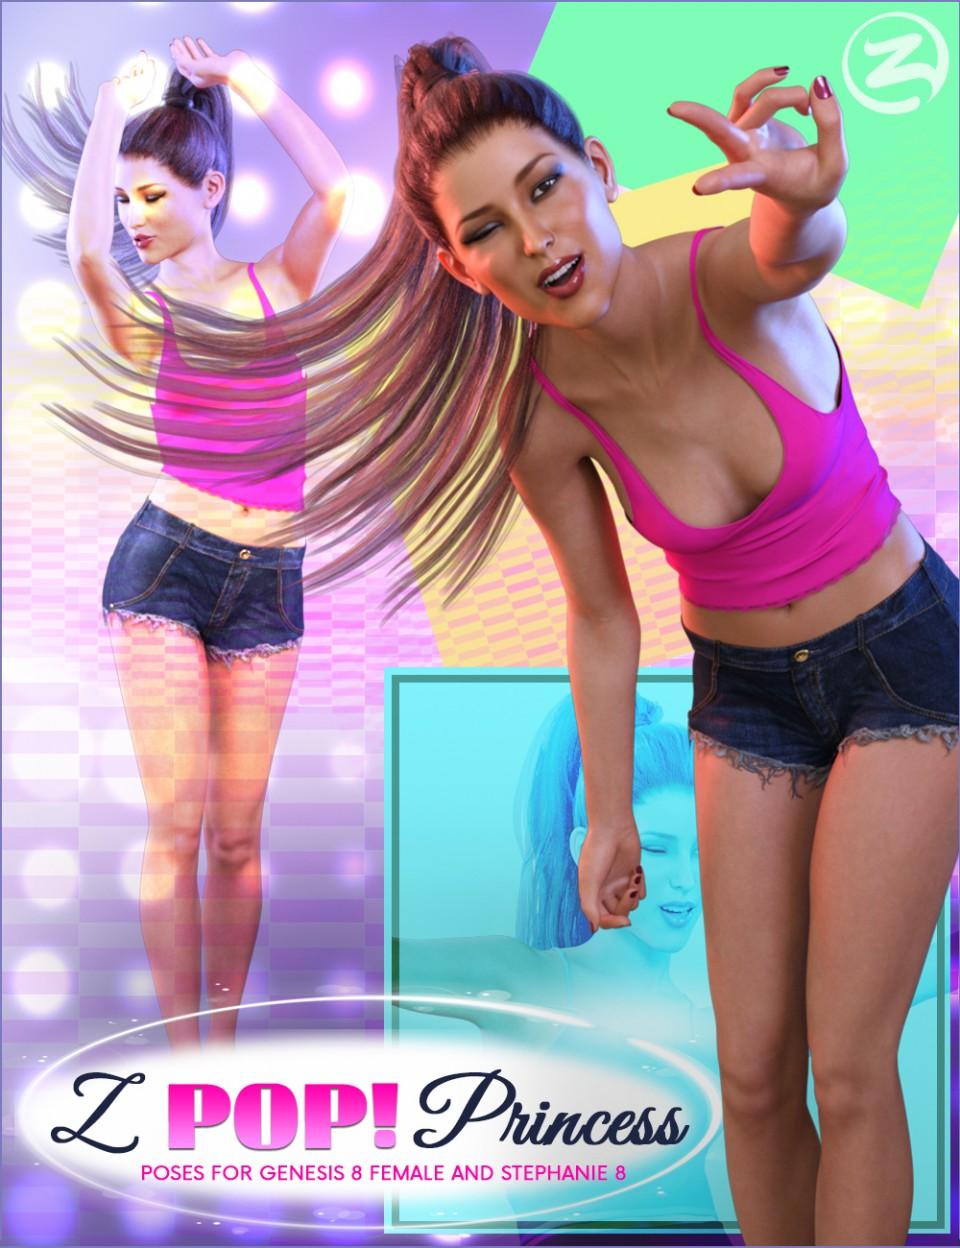 [REPOST] Z Pop Princess – Poses for Genesis 8 Female and Stephanie 8